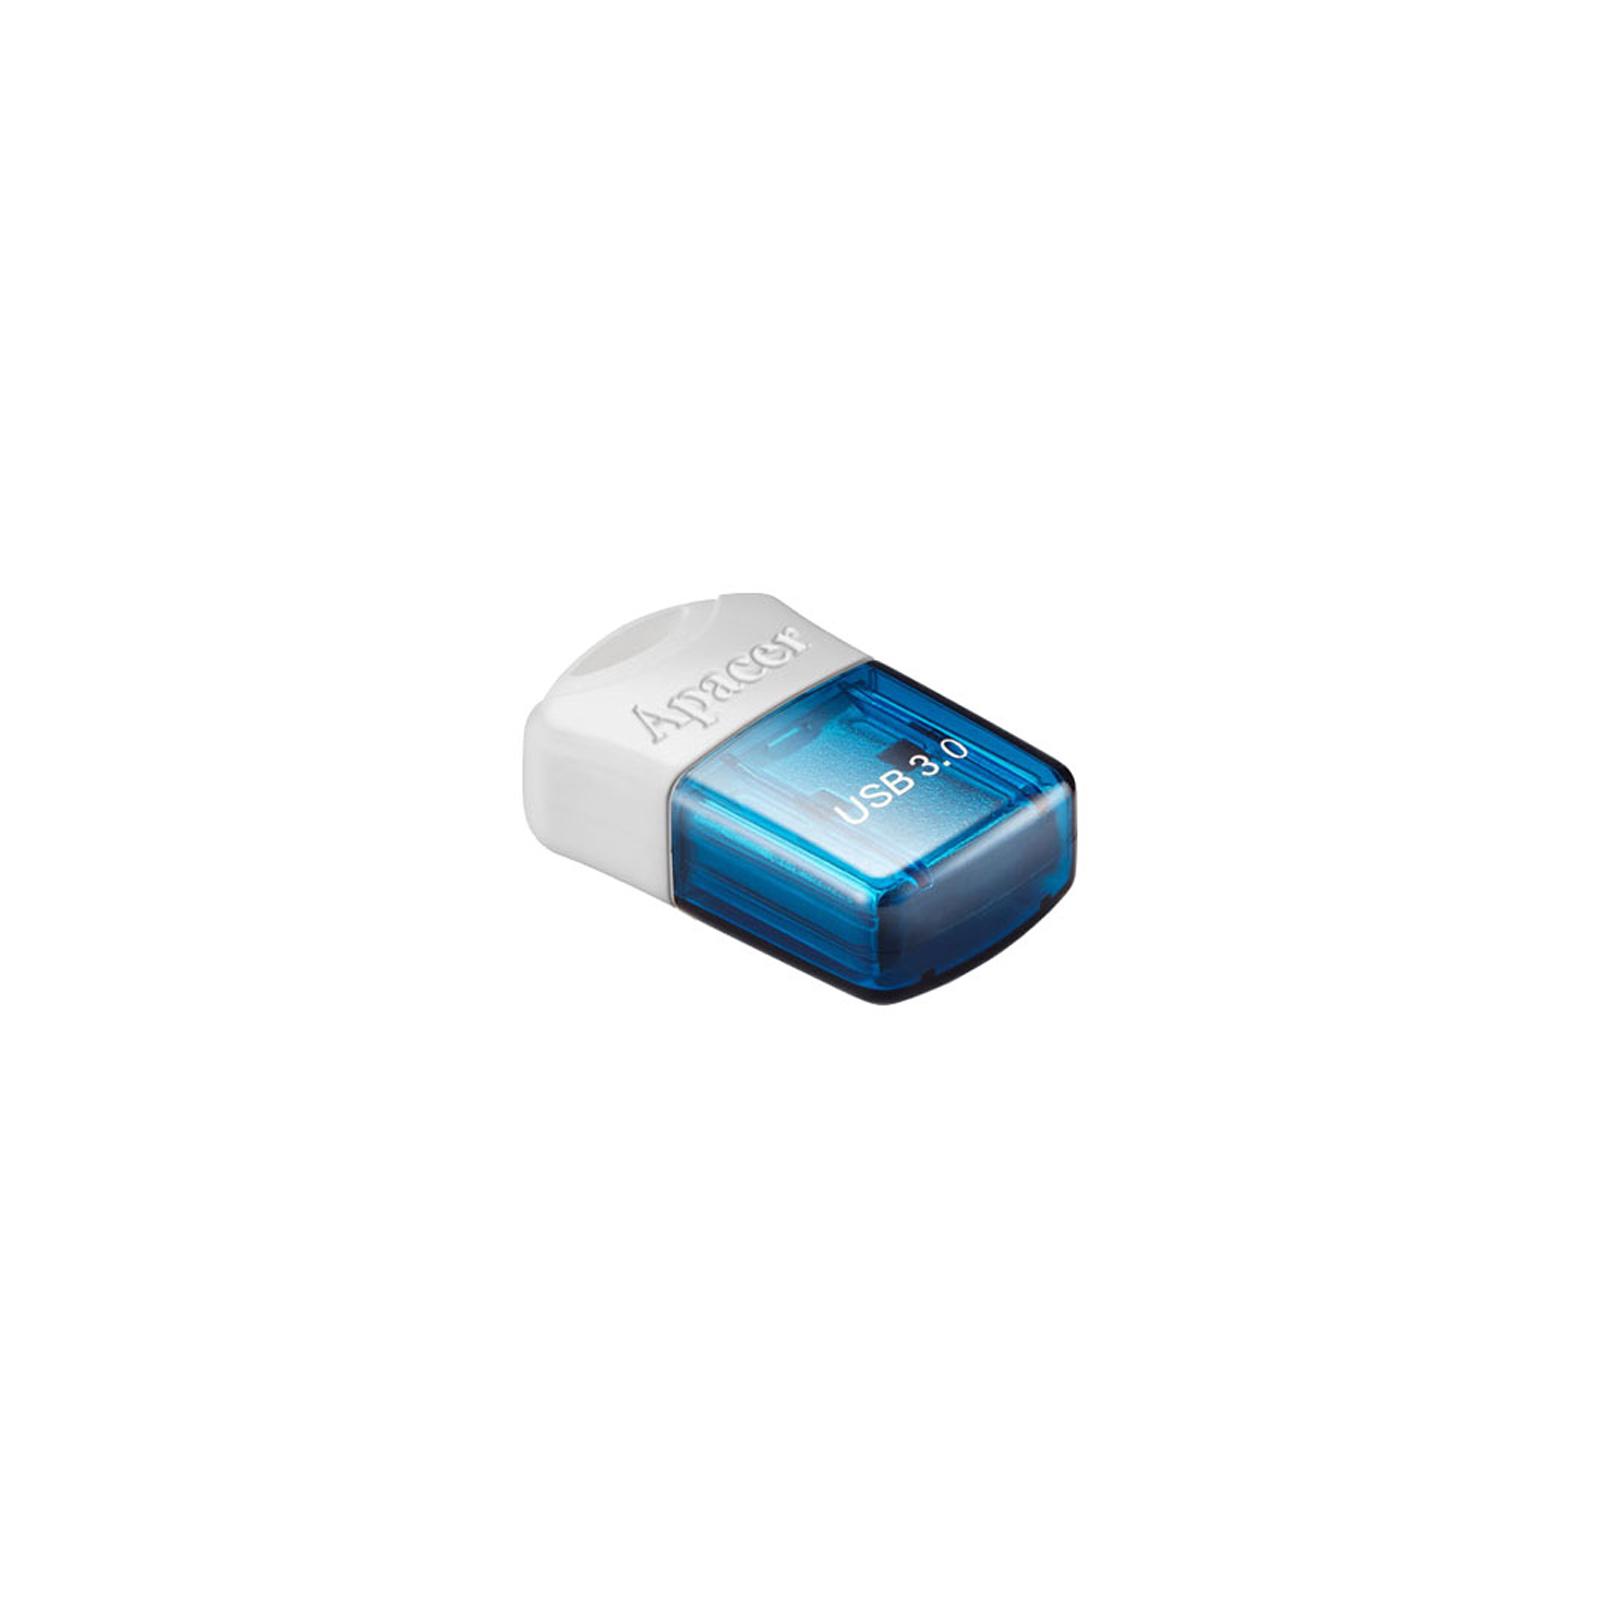 USB флеш накопитель Apacer 32GB AH157 Blue USB 3.0 (AP32GAH157U-1) изображение 3